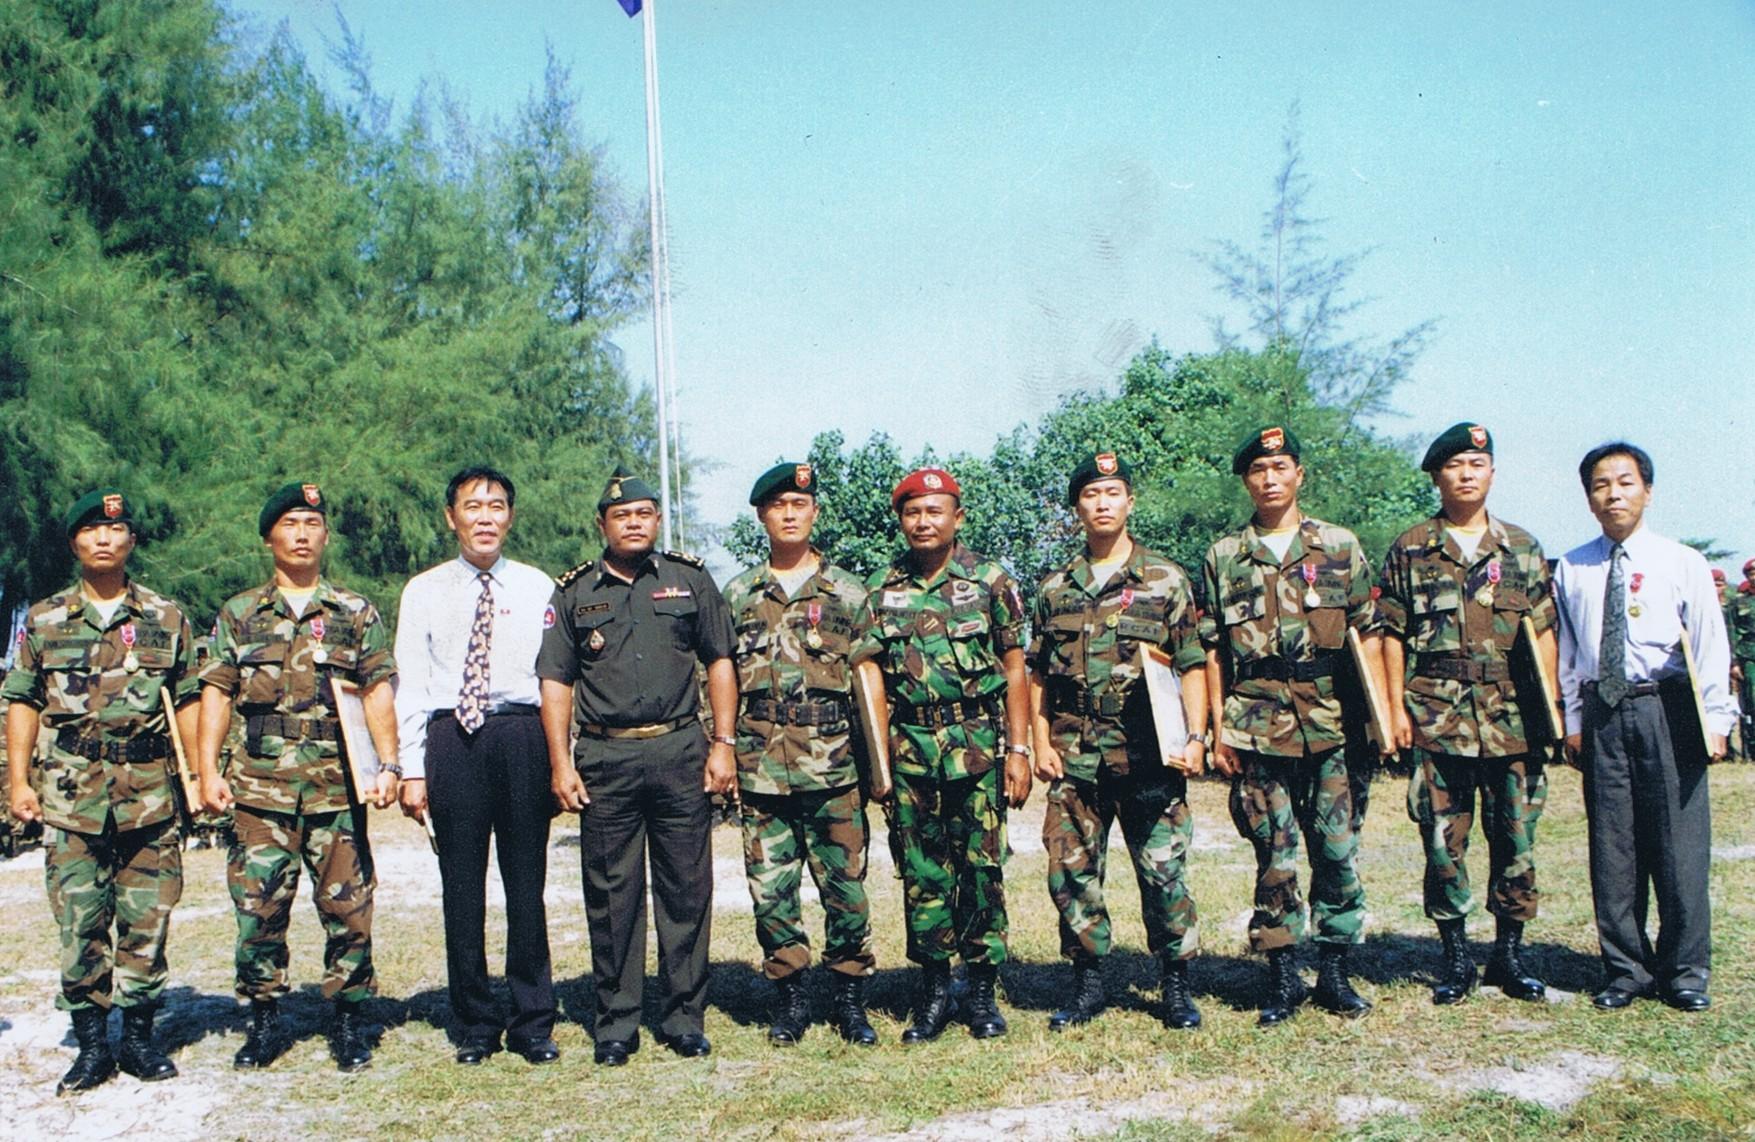 JJK-Cambodge 2